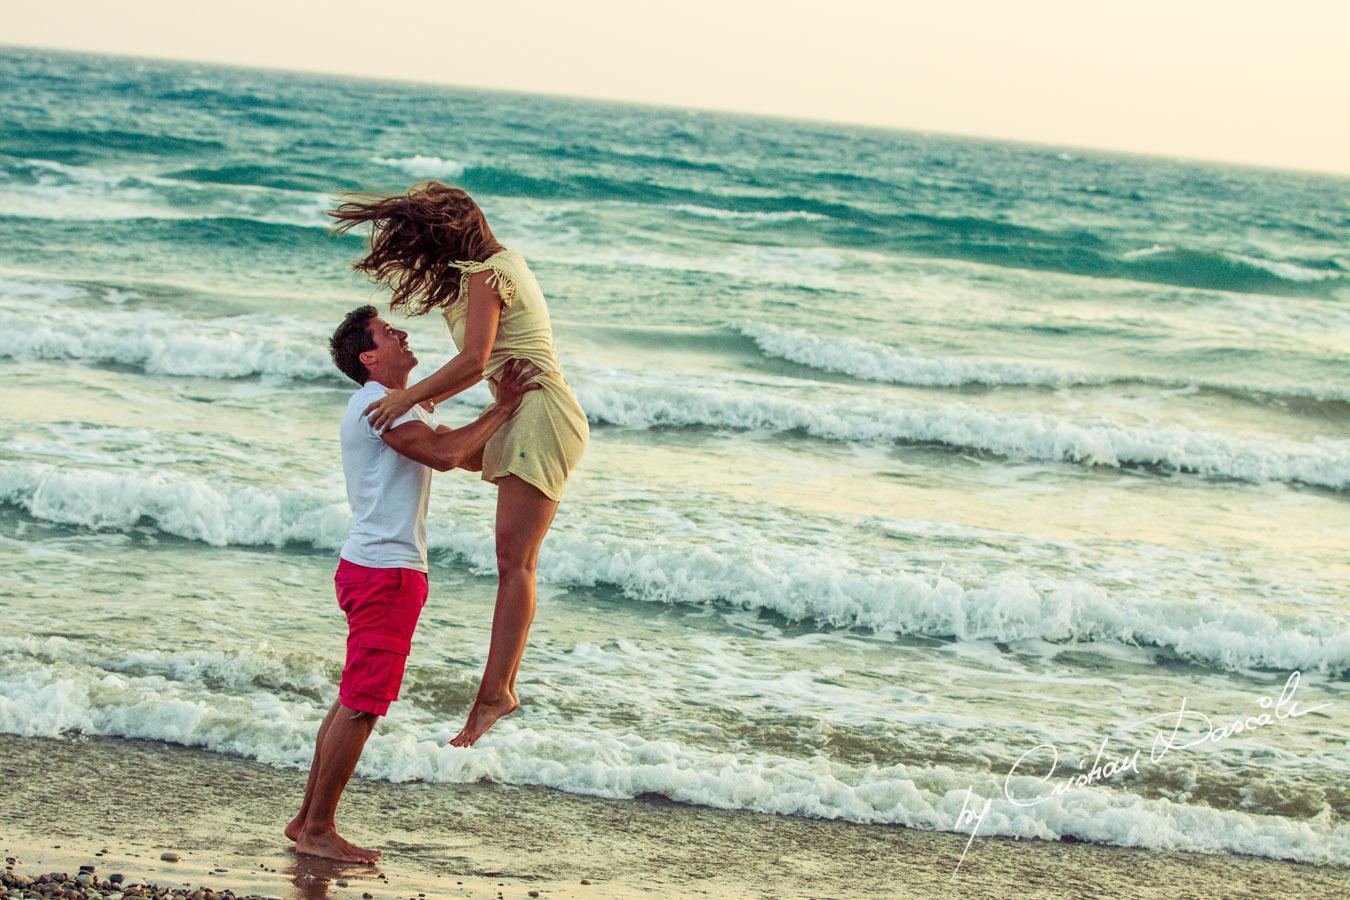 Photo Shoot in Cyprus - Nicky, Laura & Caitlin. Cyprus Photographer: Cristian Dascalu